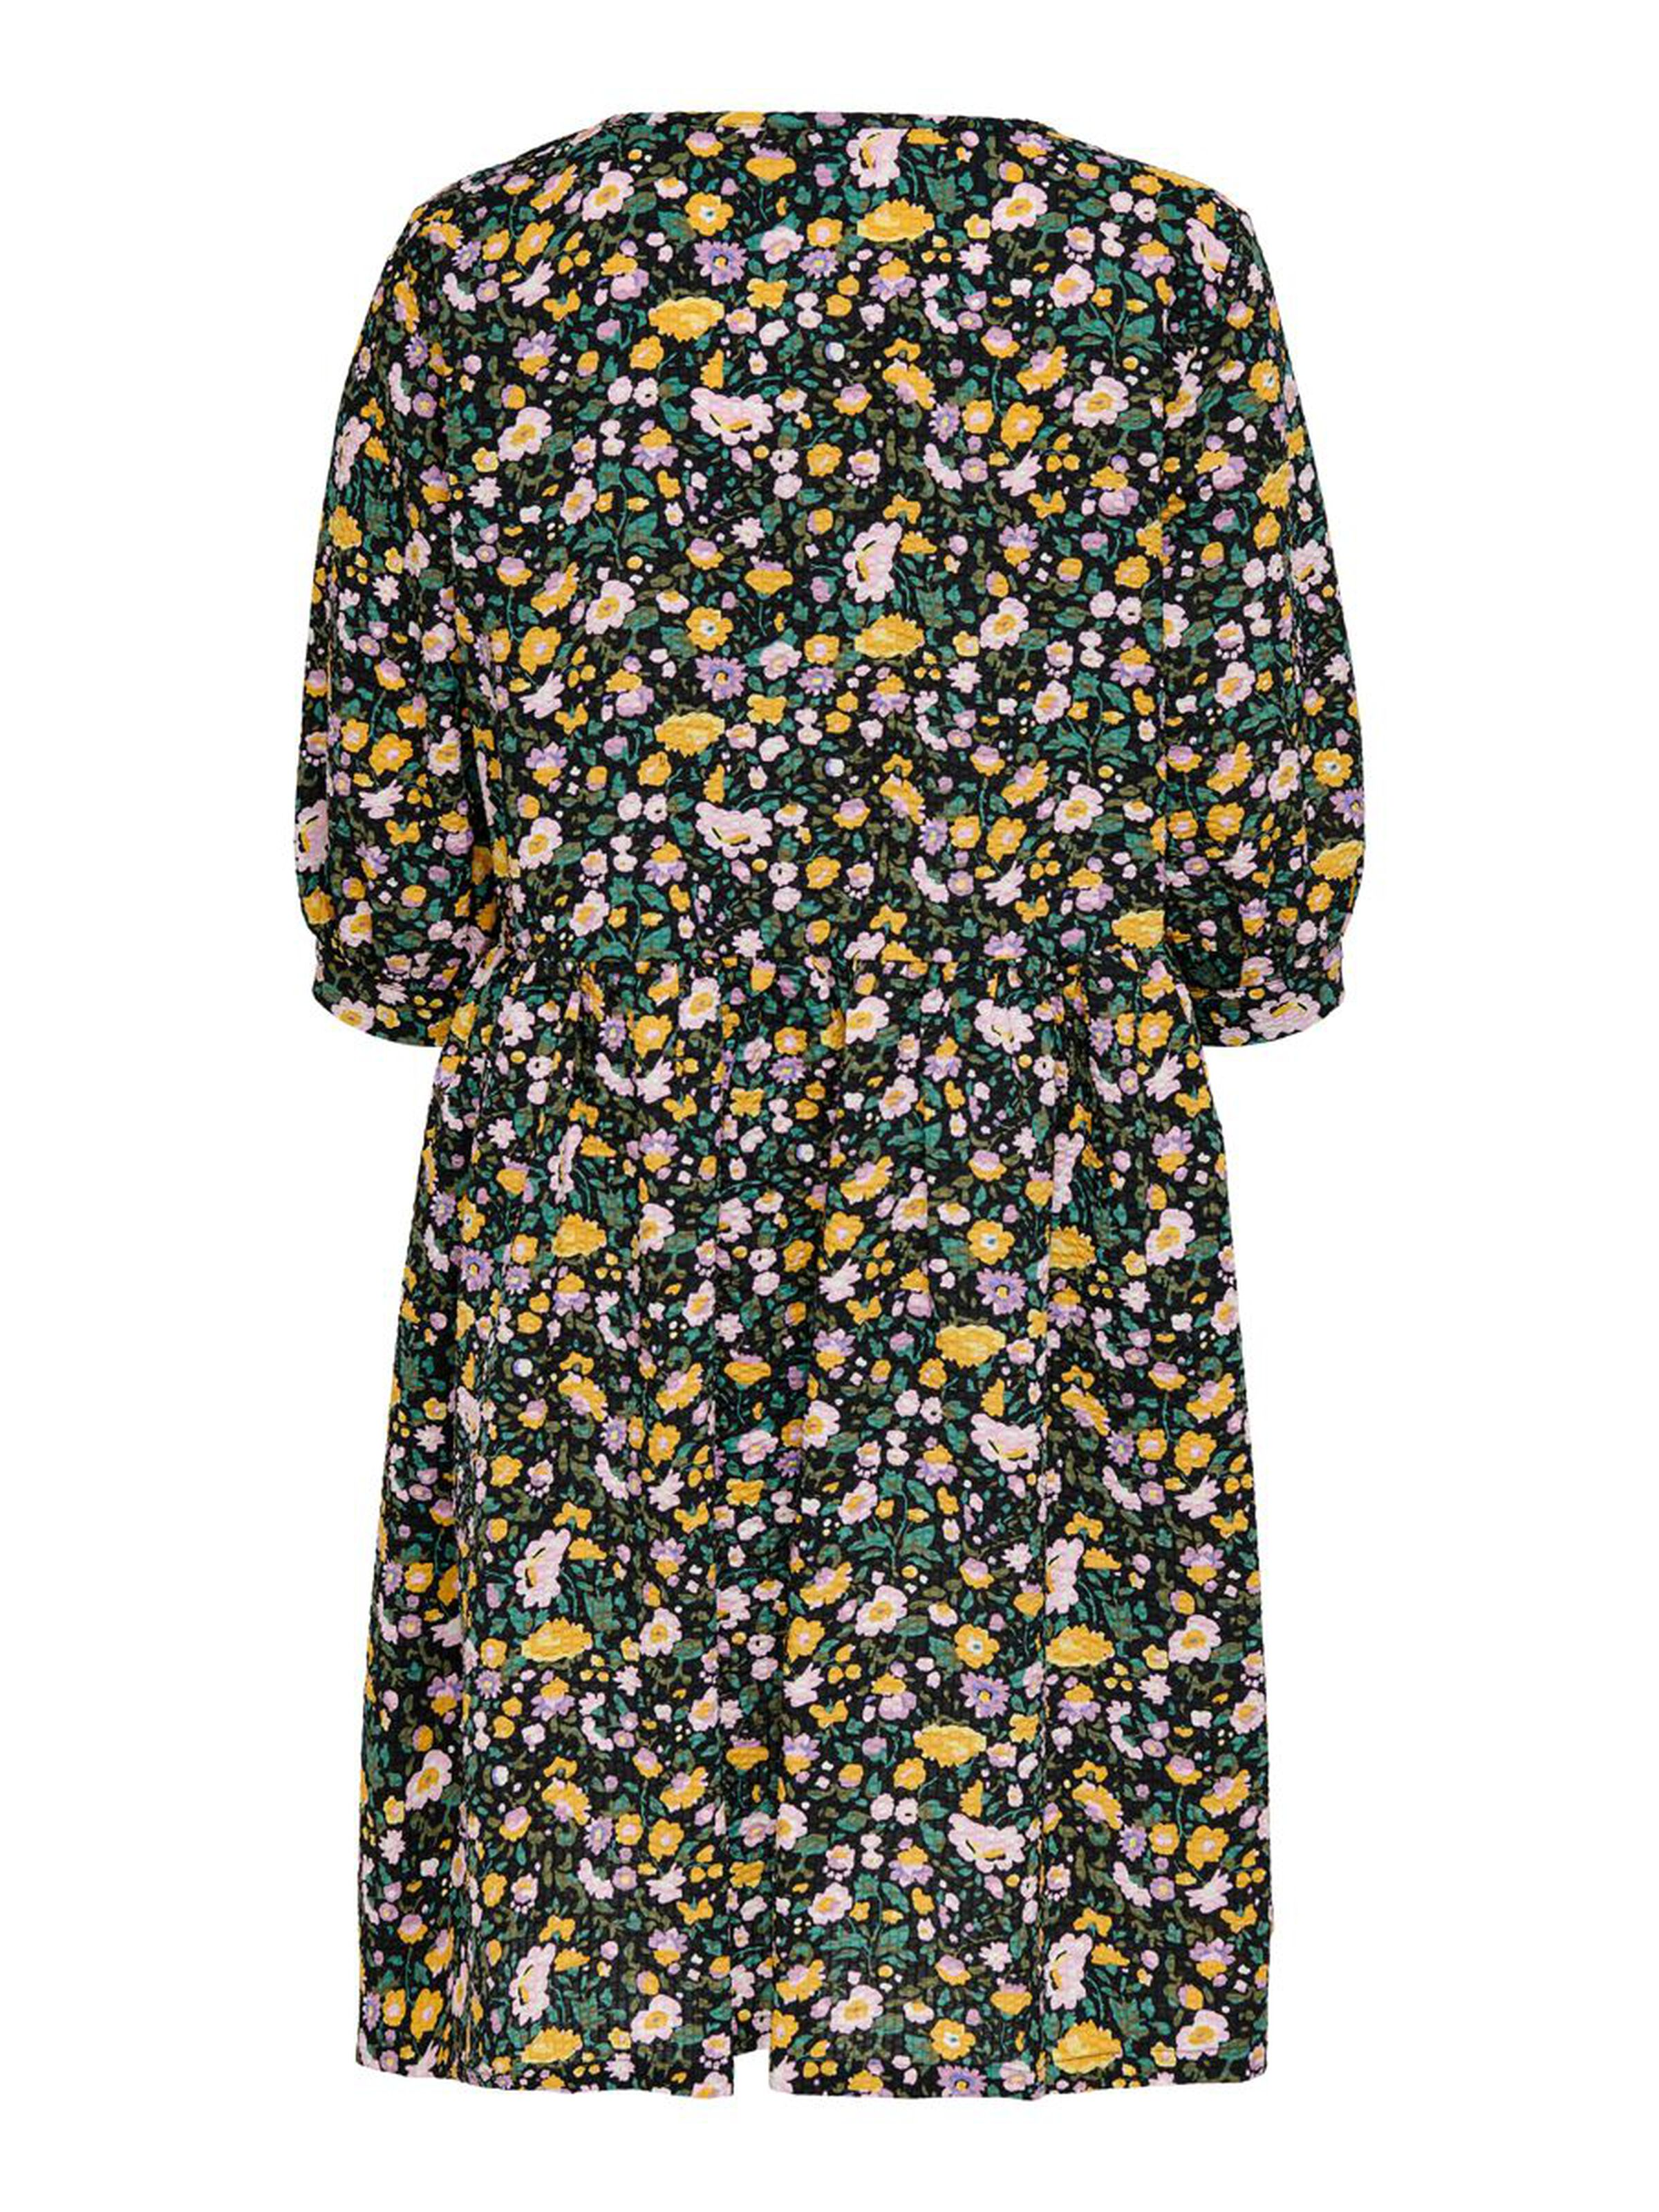 Only Lua 2/4 printet kjole, black/purple, large